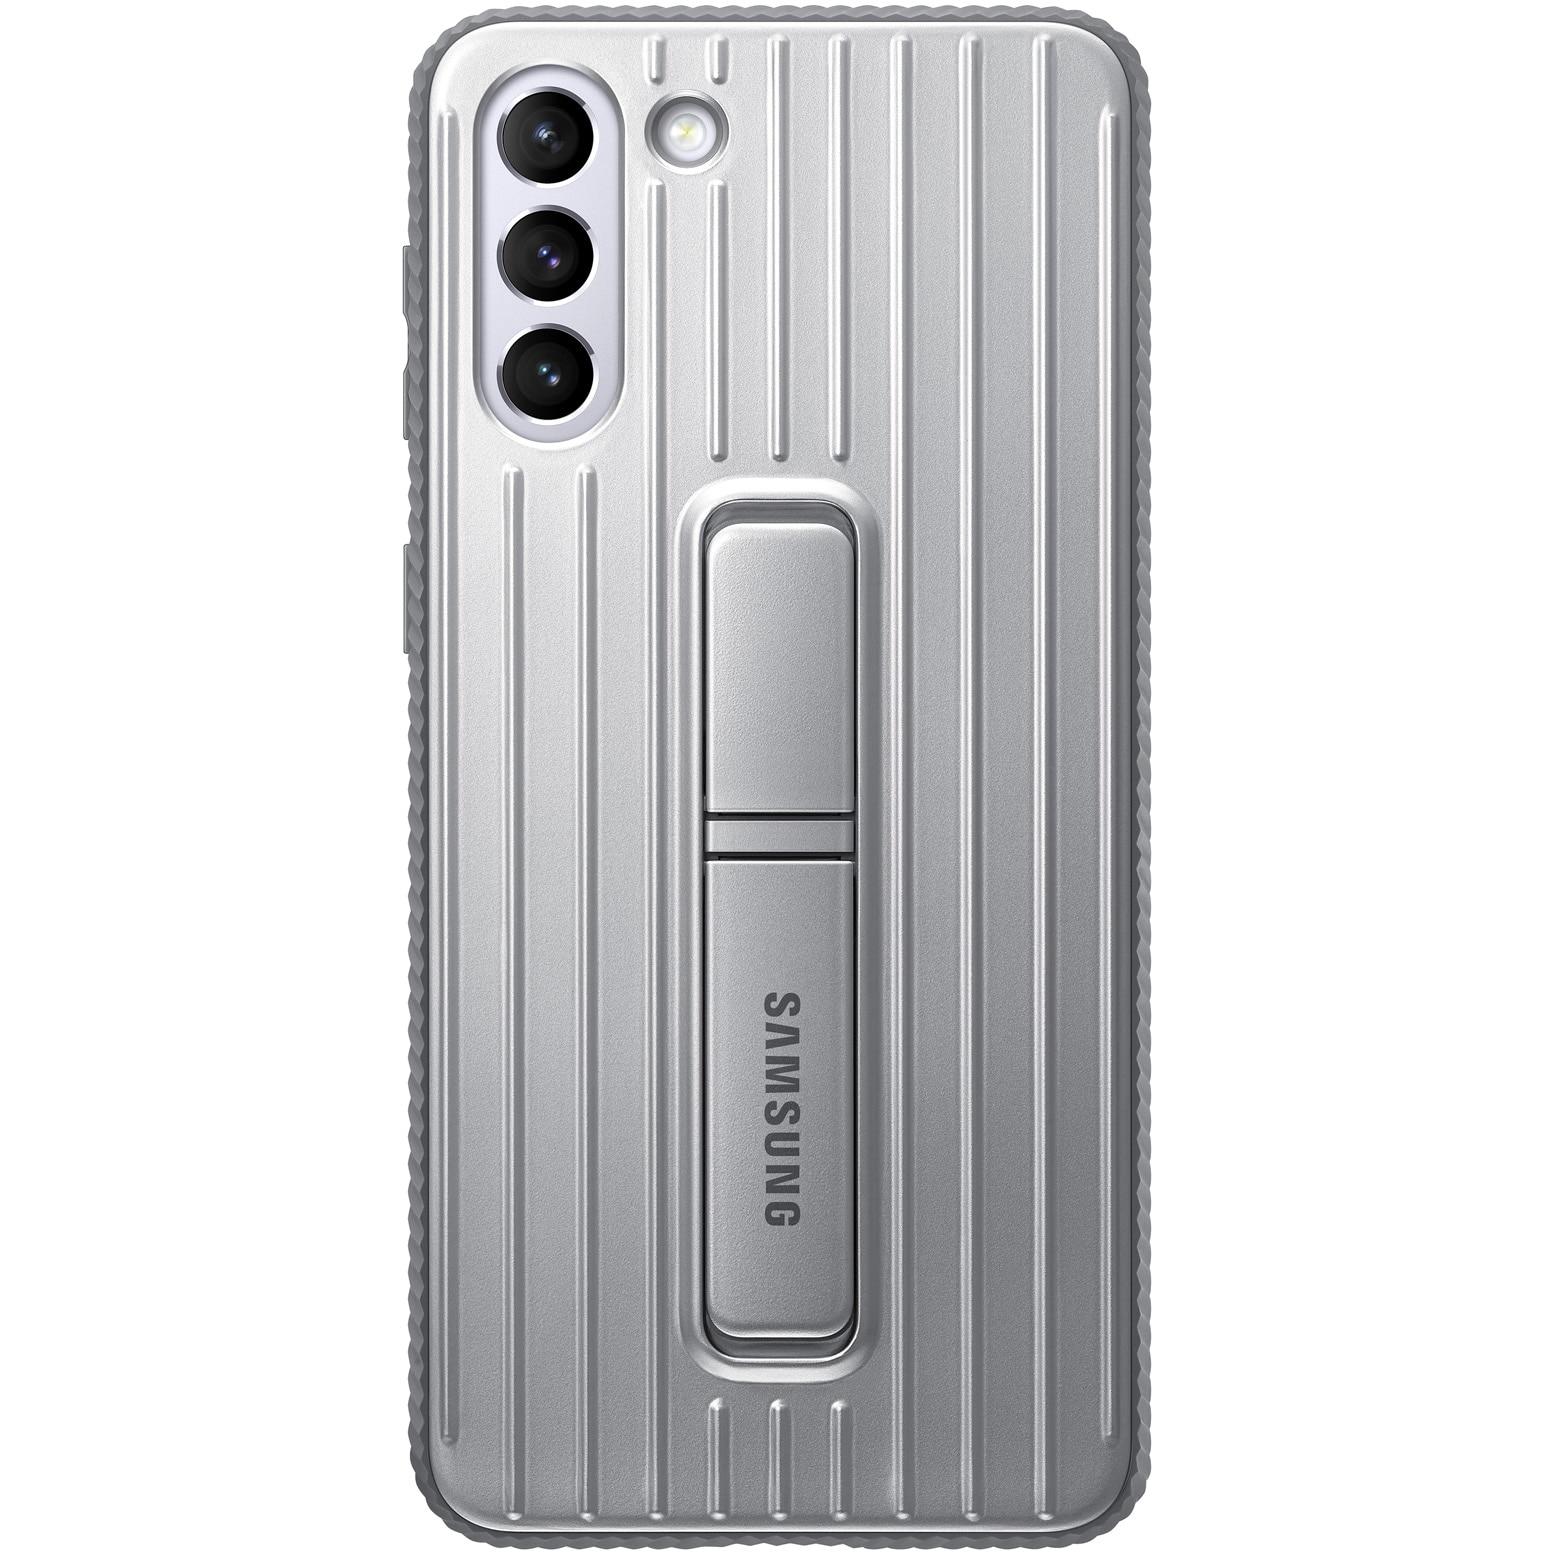 Fotografie Husa de protectie Samsung Protective Standing Cover pentru Galaxy S21 Plus, Light Gray